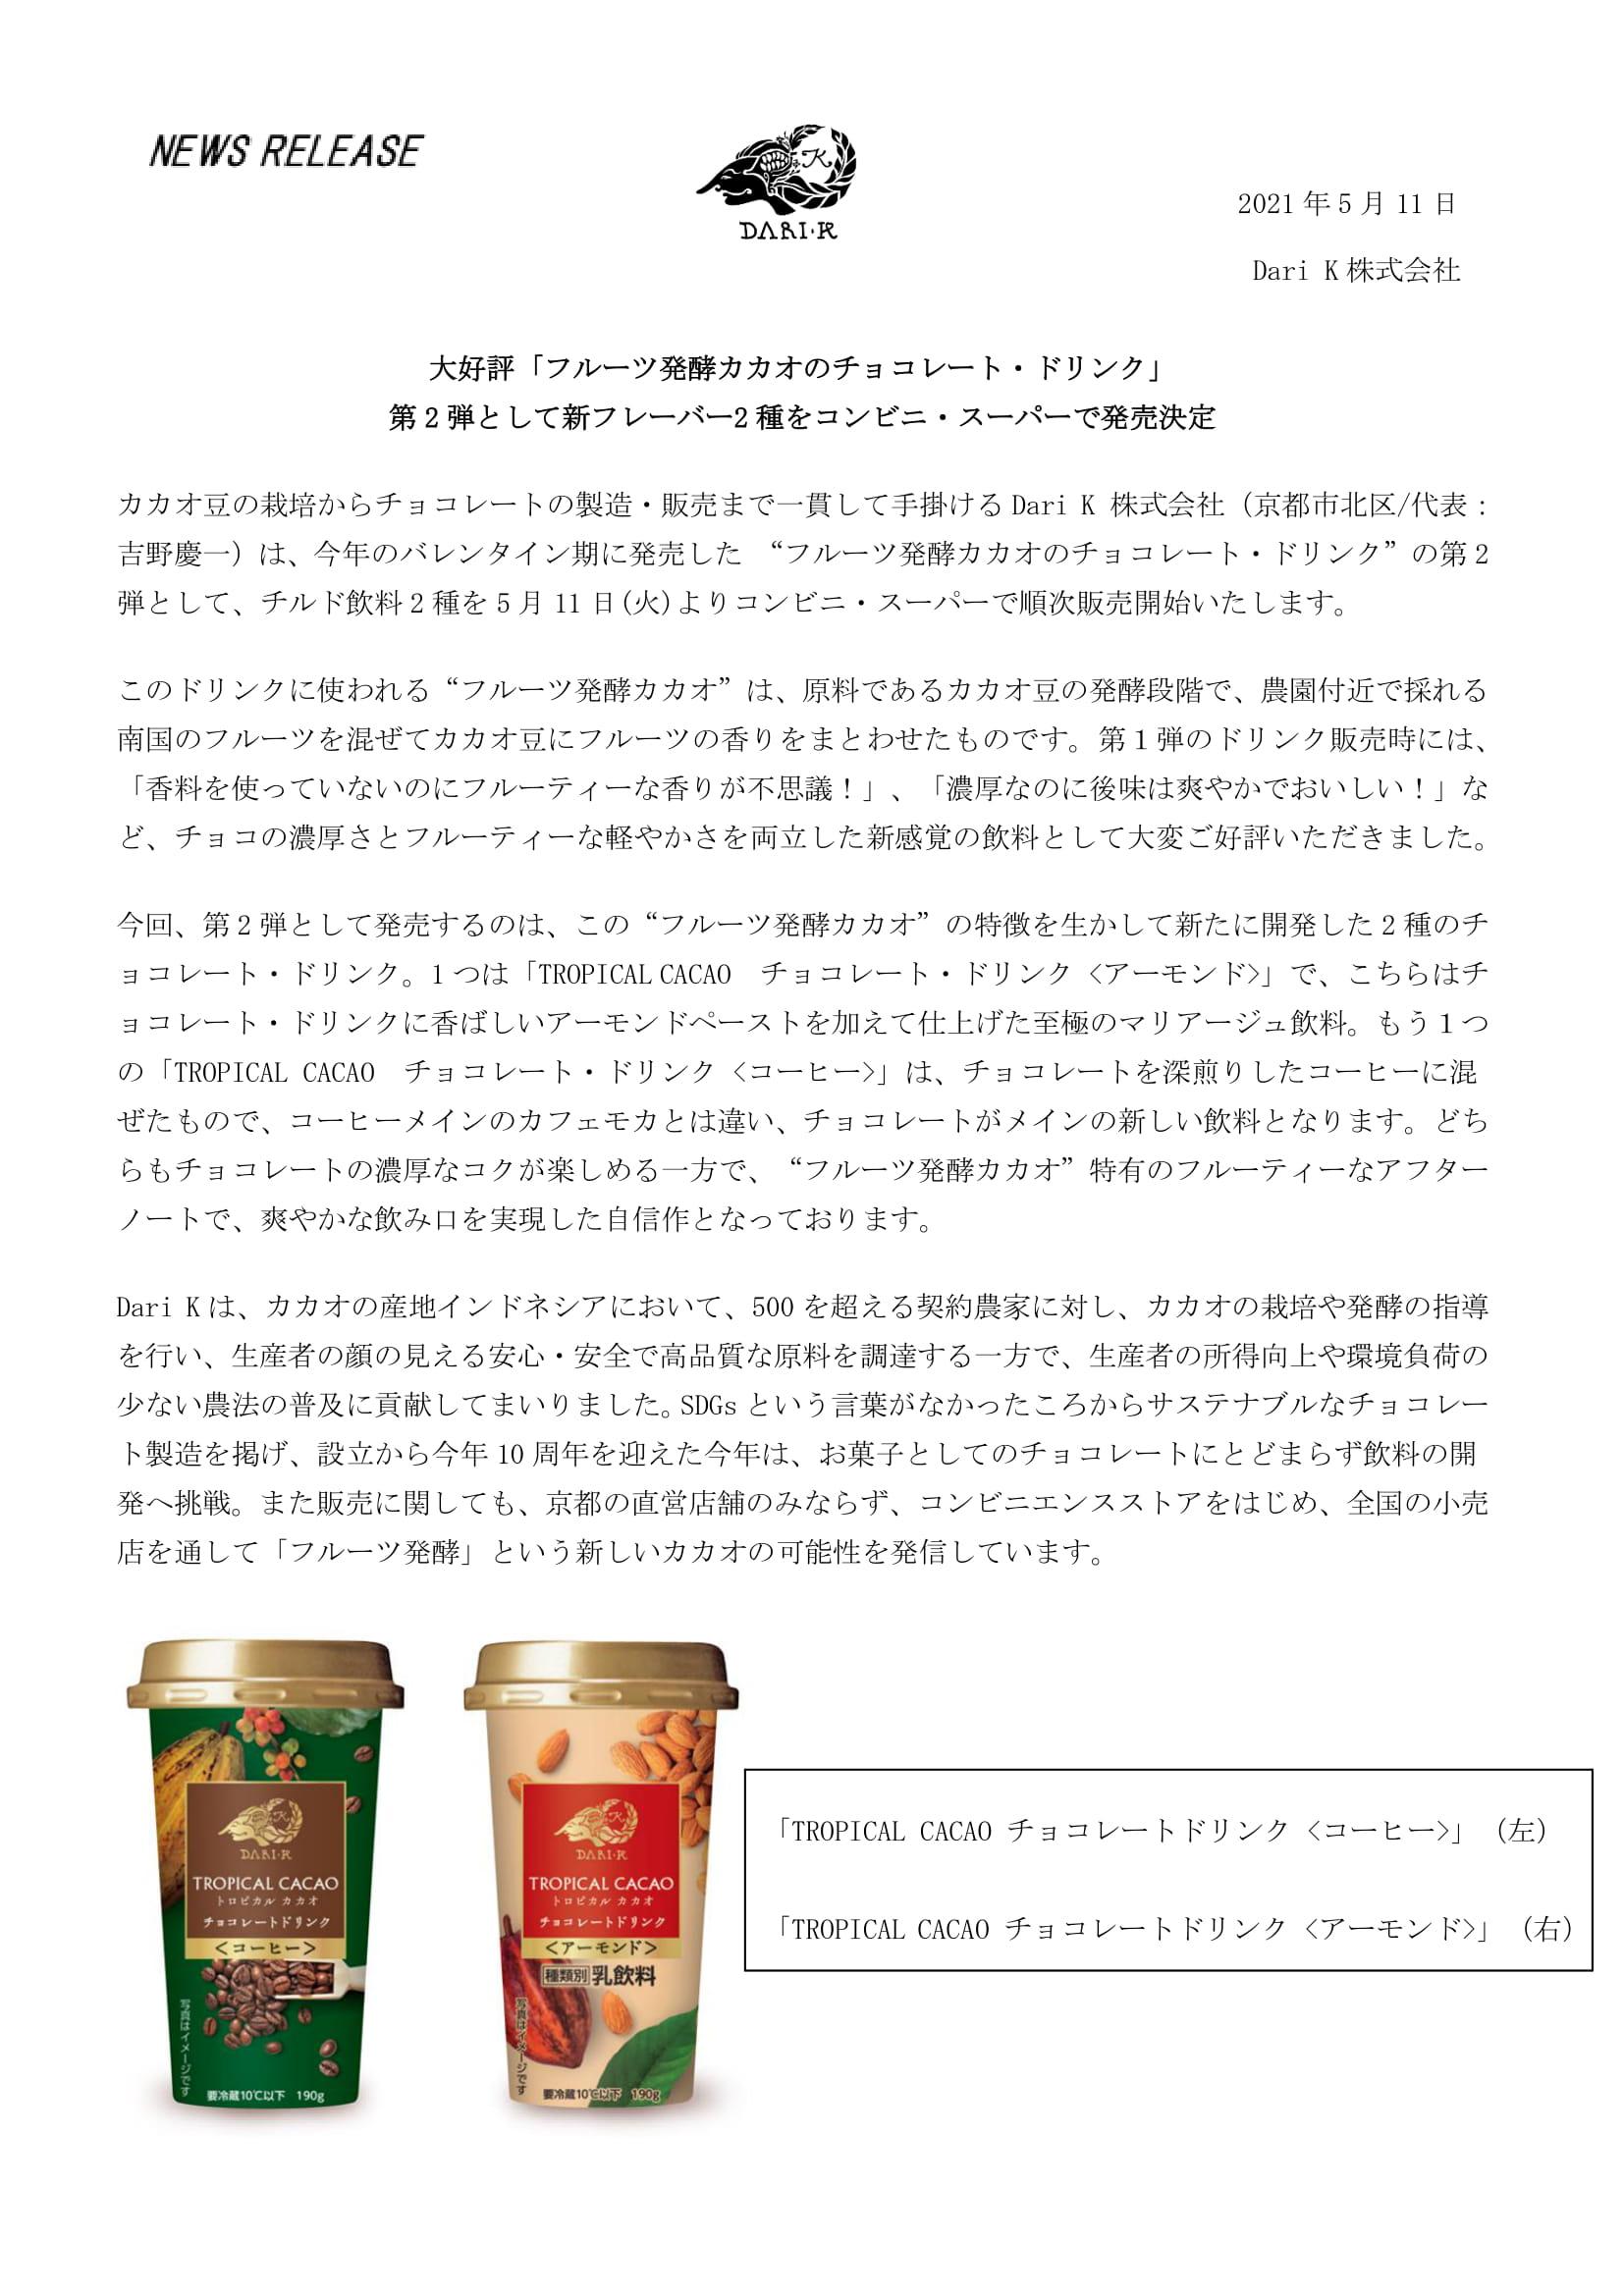 【Dari K】Press Release Cacao Drink210510 Draft_FINAL-1